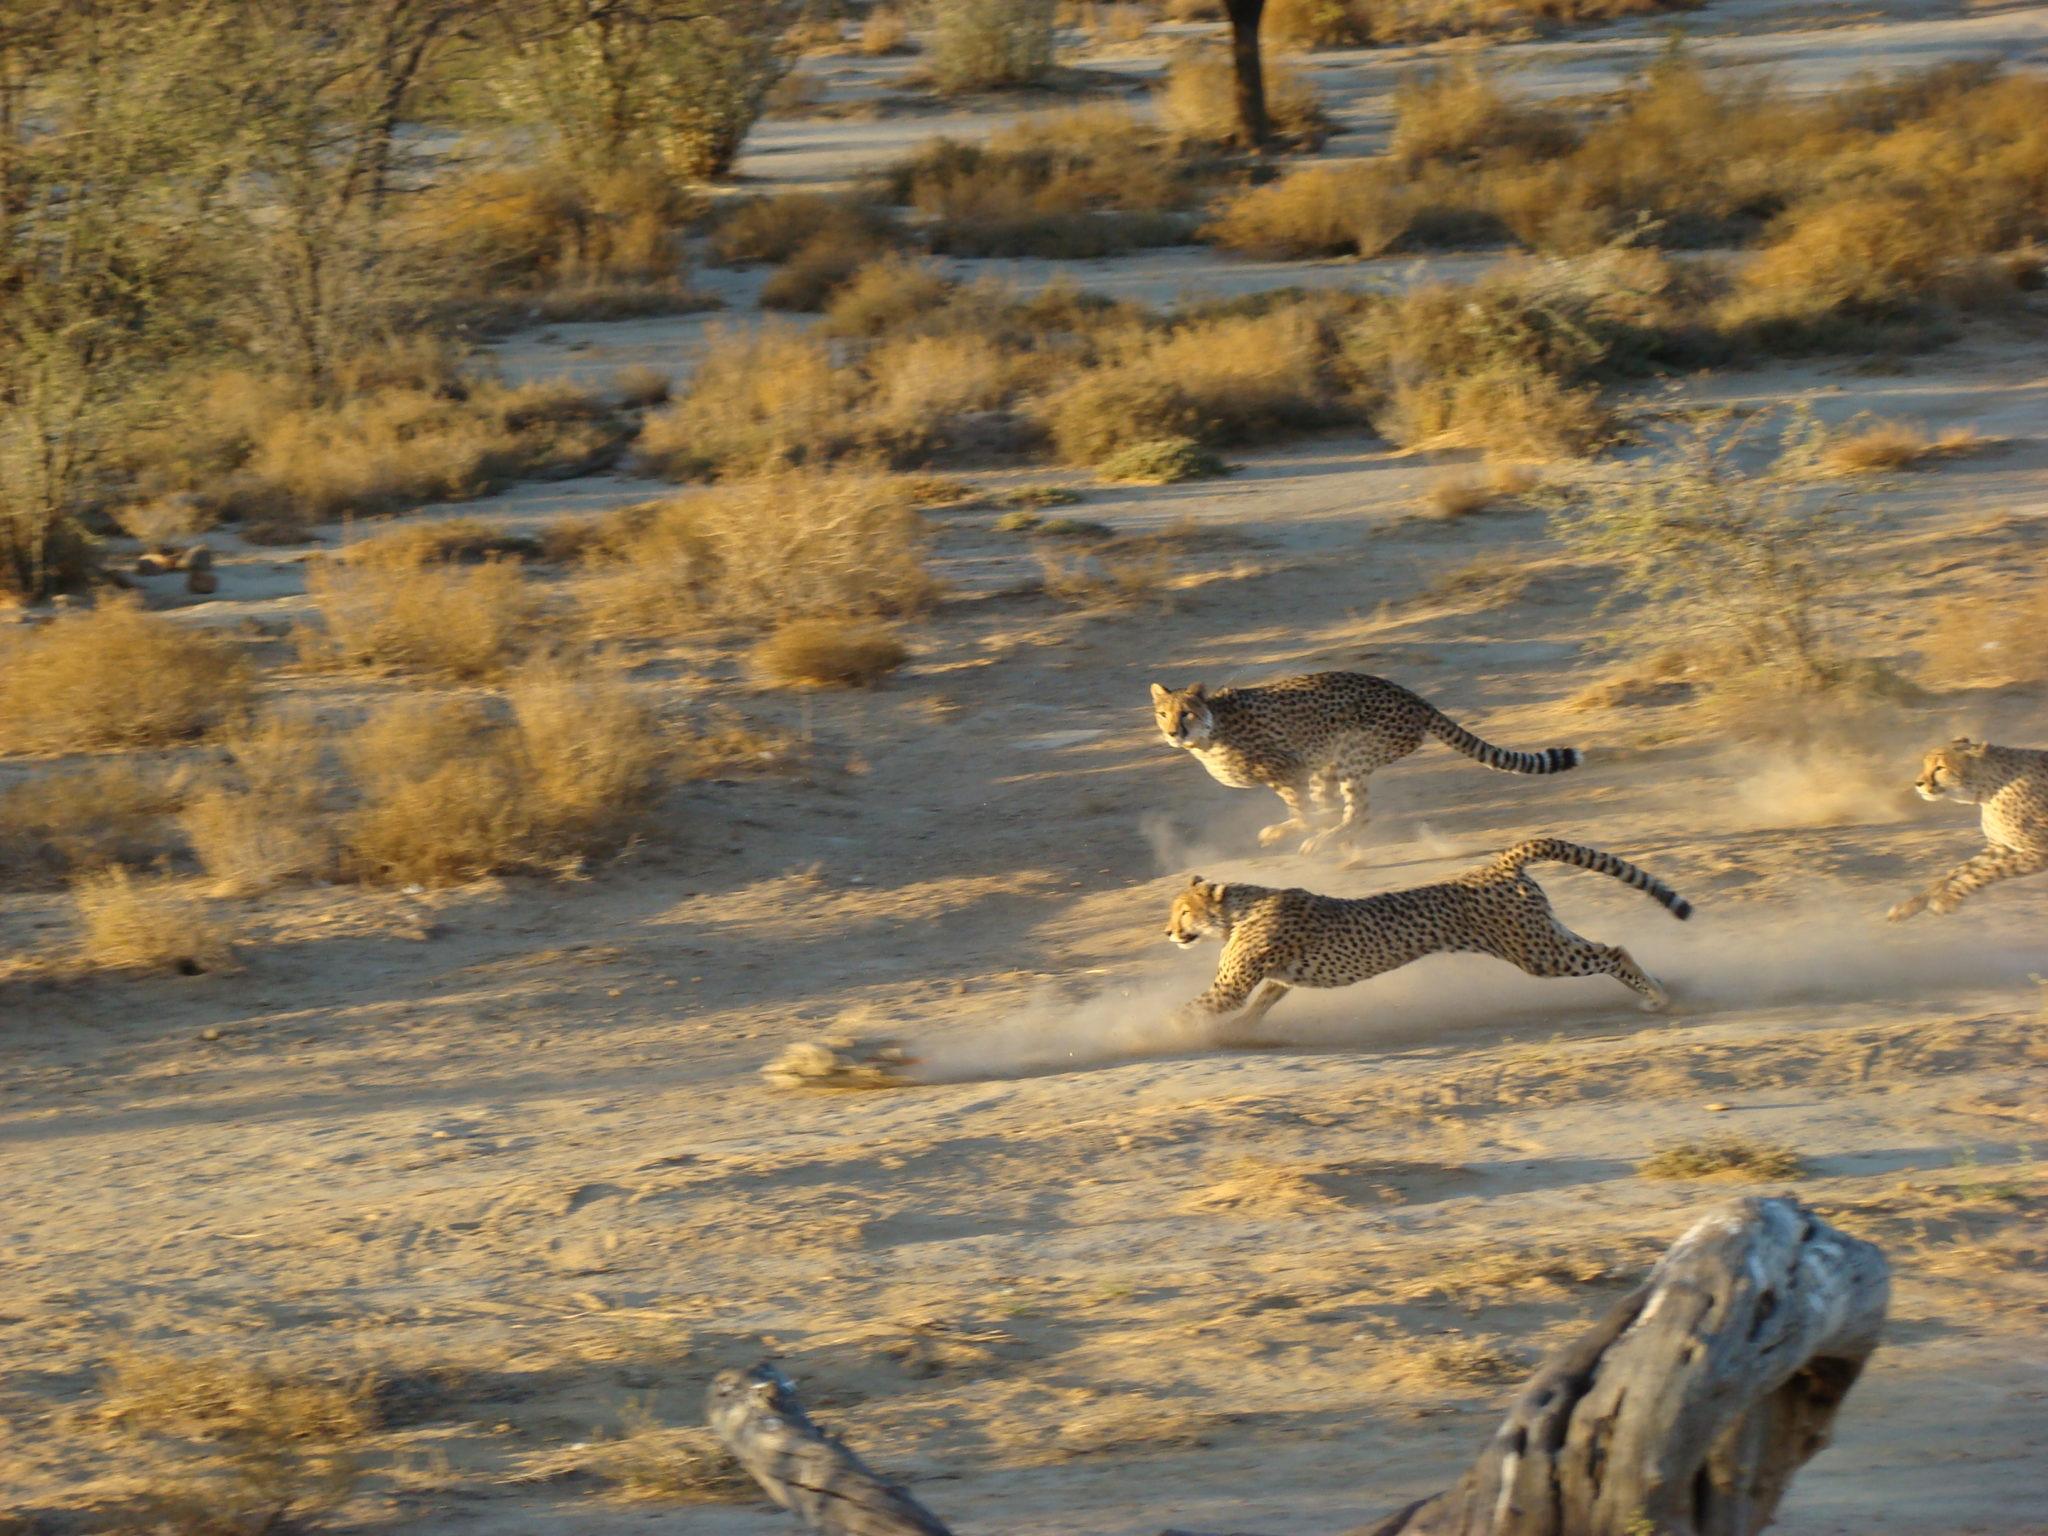 Cheetah-chase.JPG